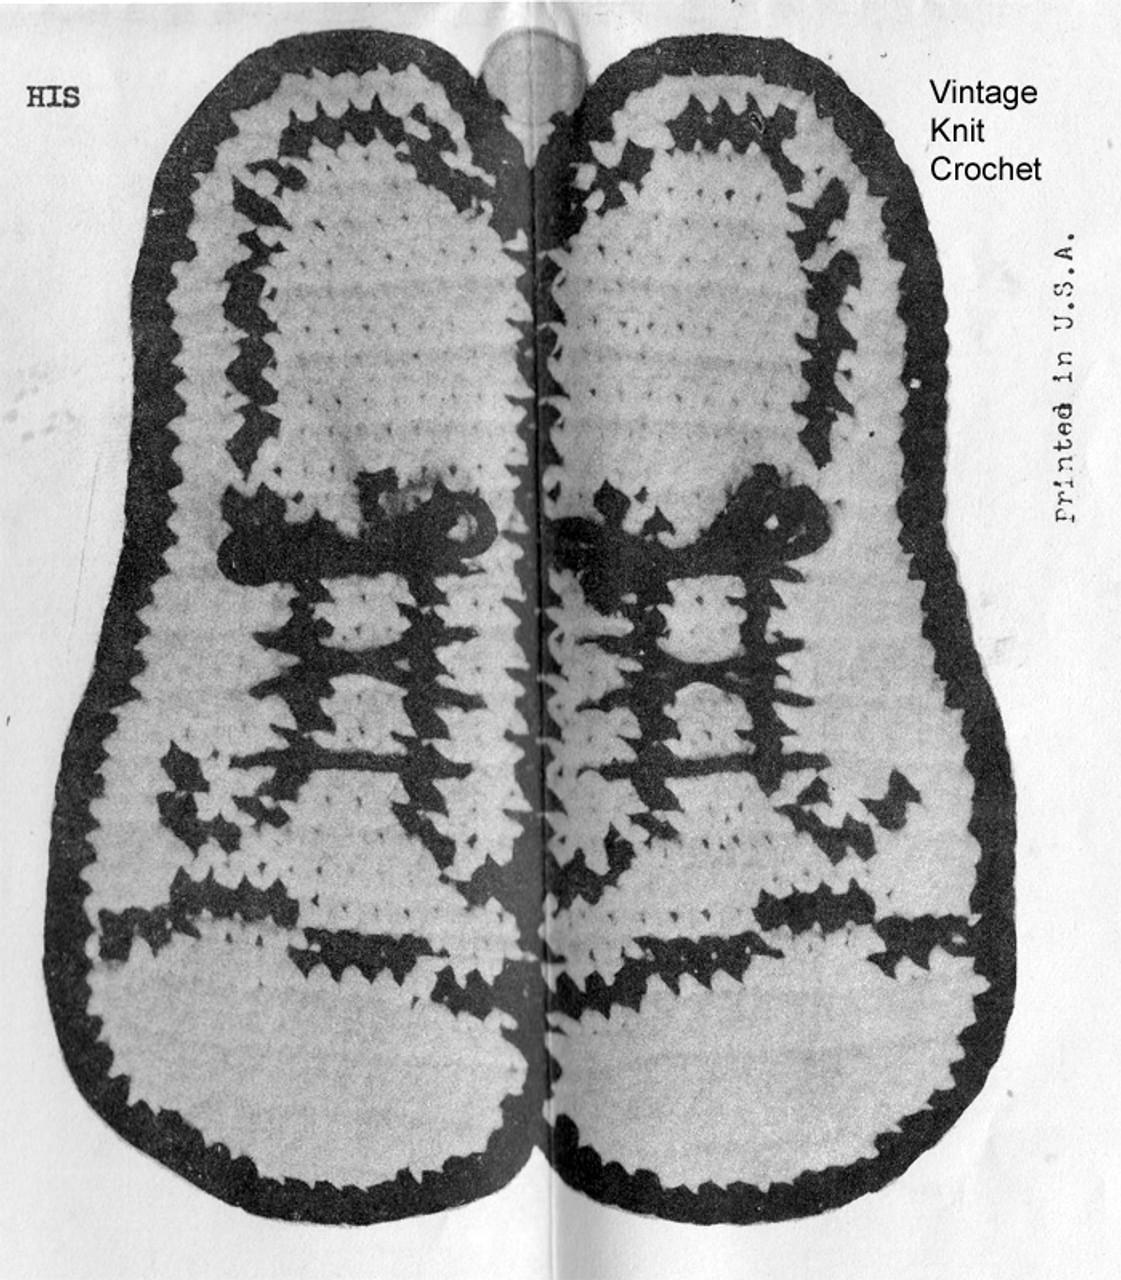 Crochet Shoe Potholders Pattern - His